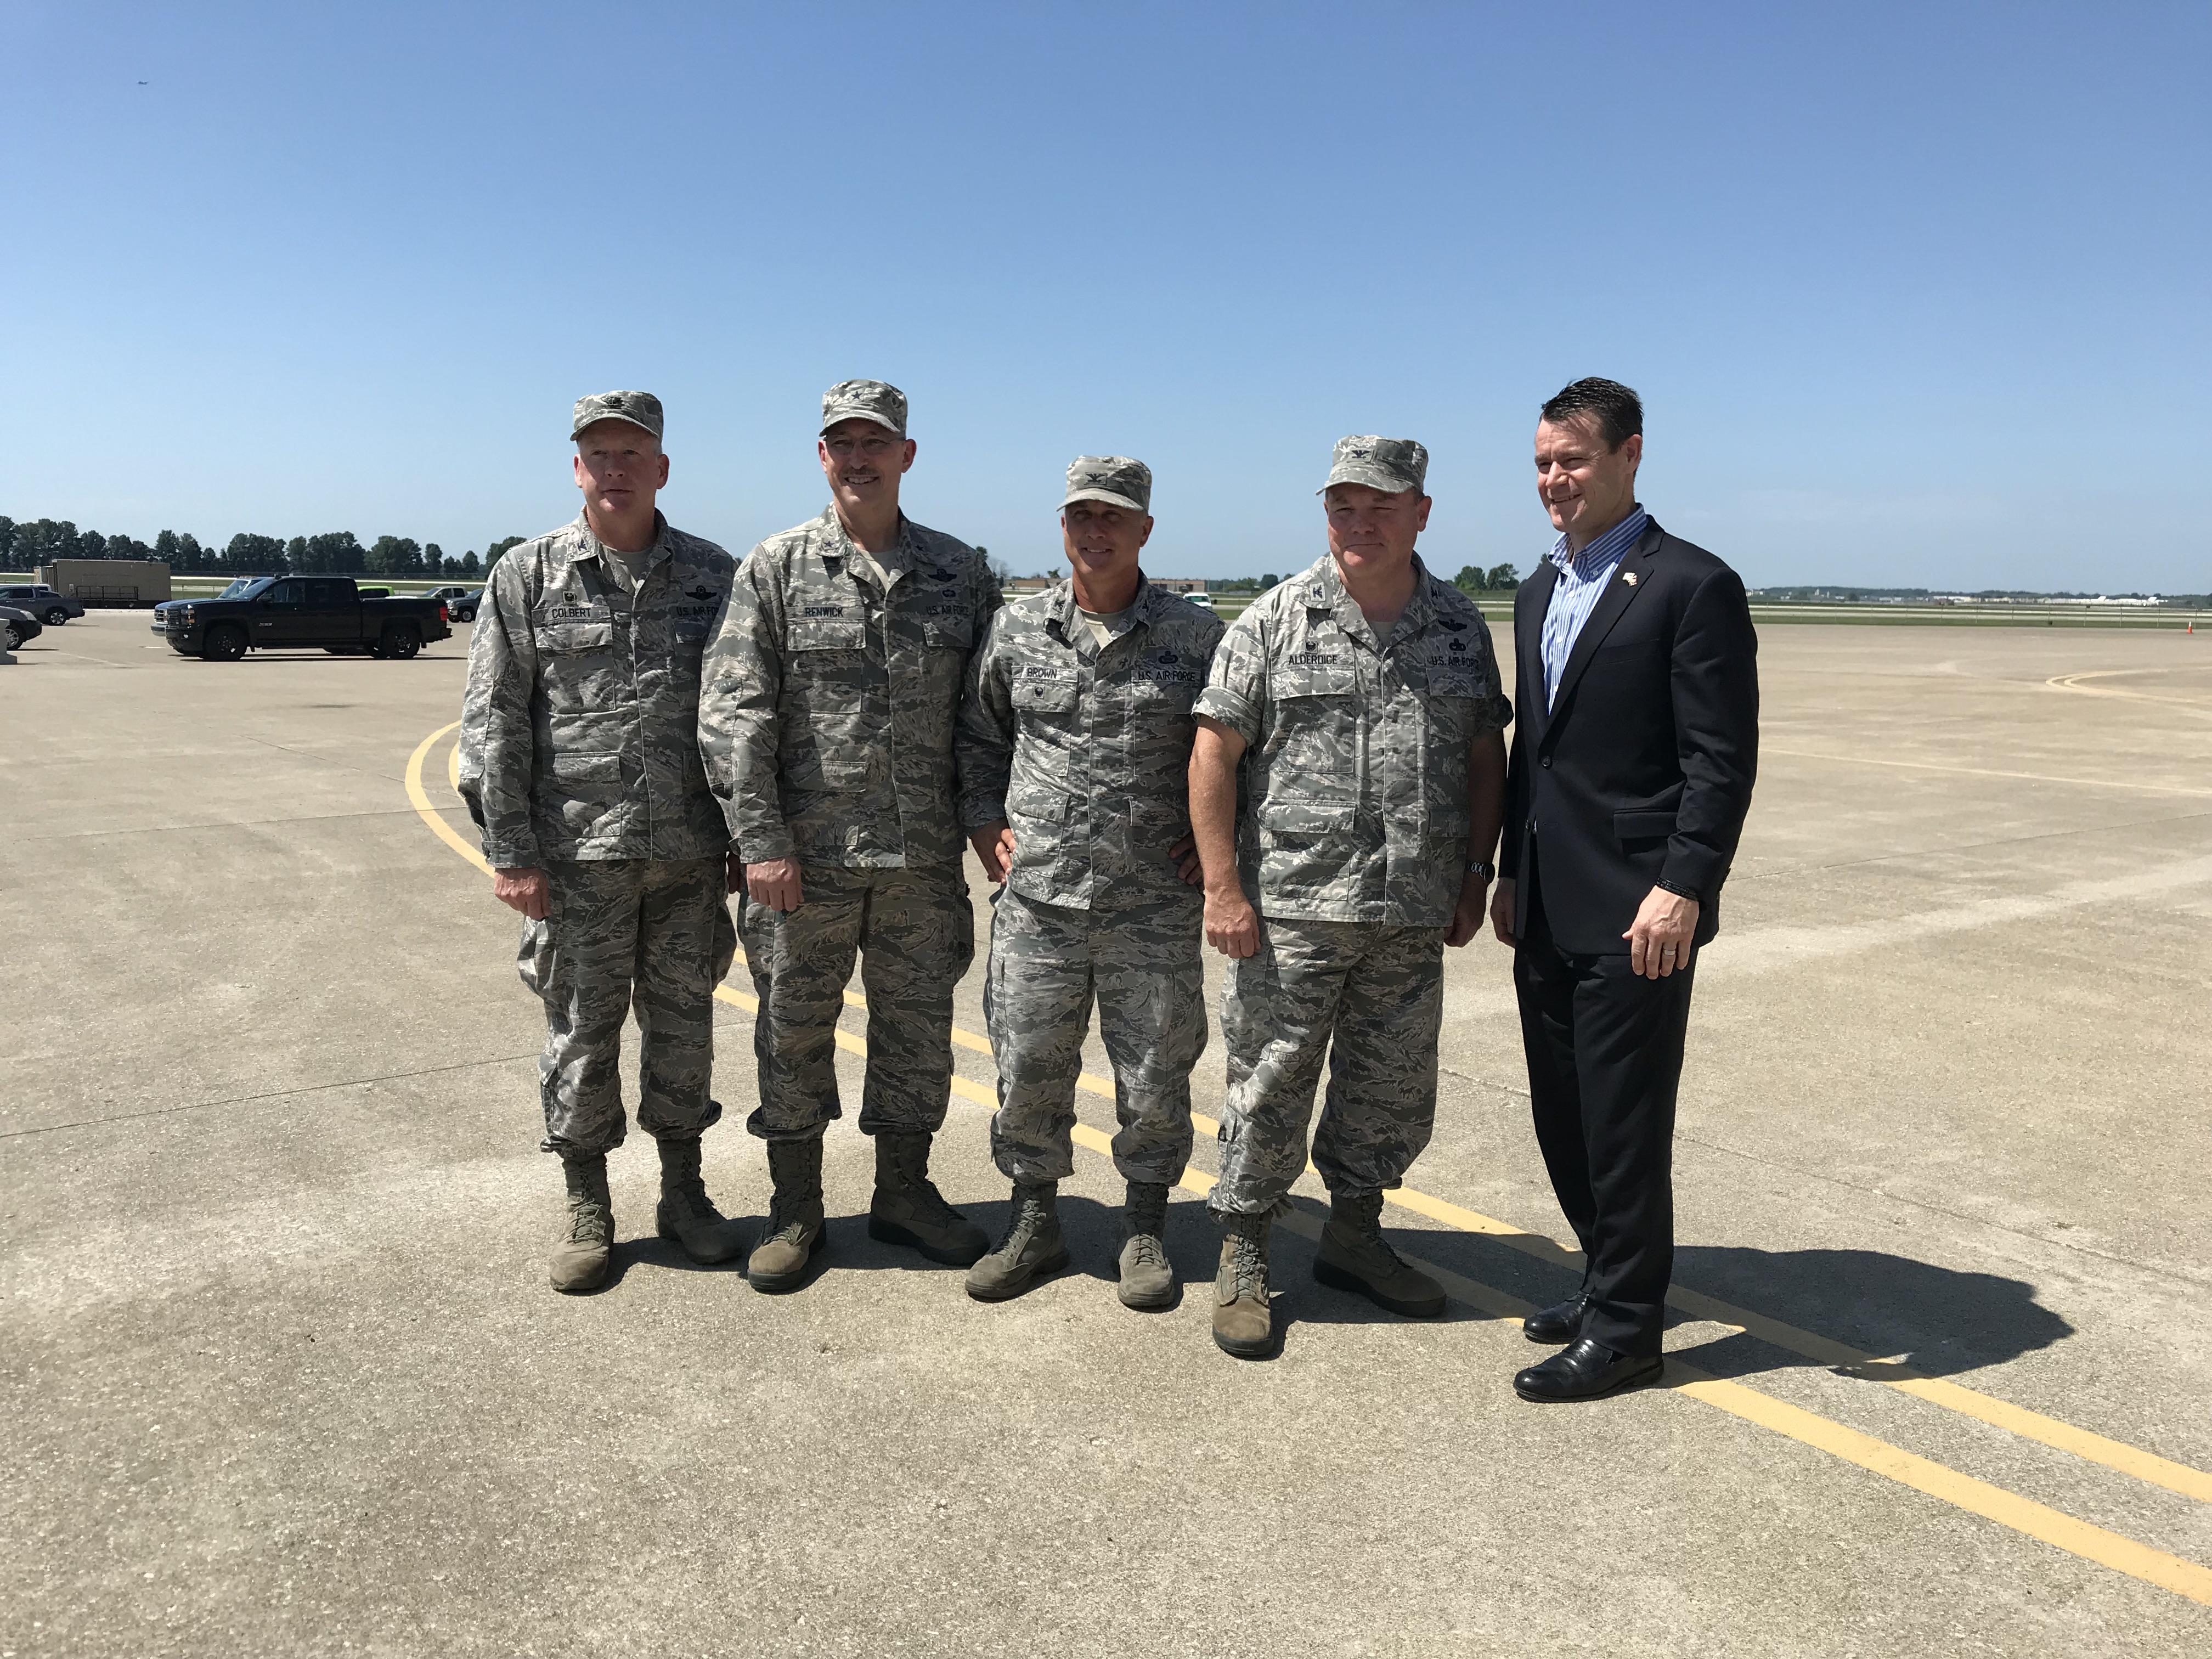 Young Visits Key Indiana Military Bases 3